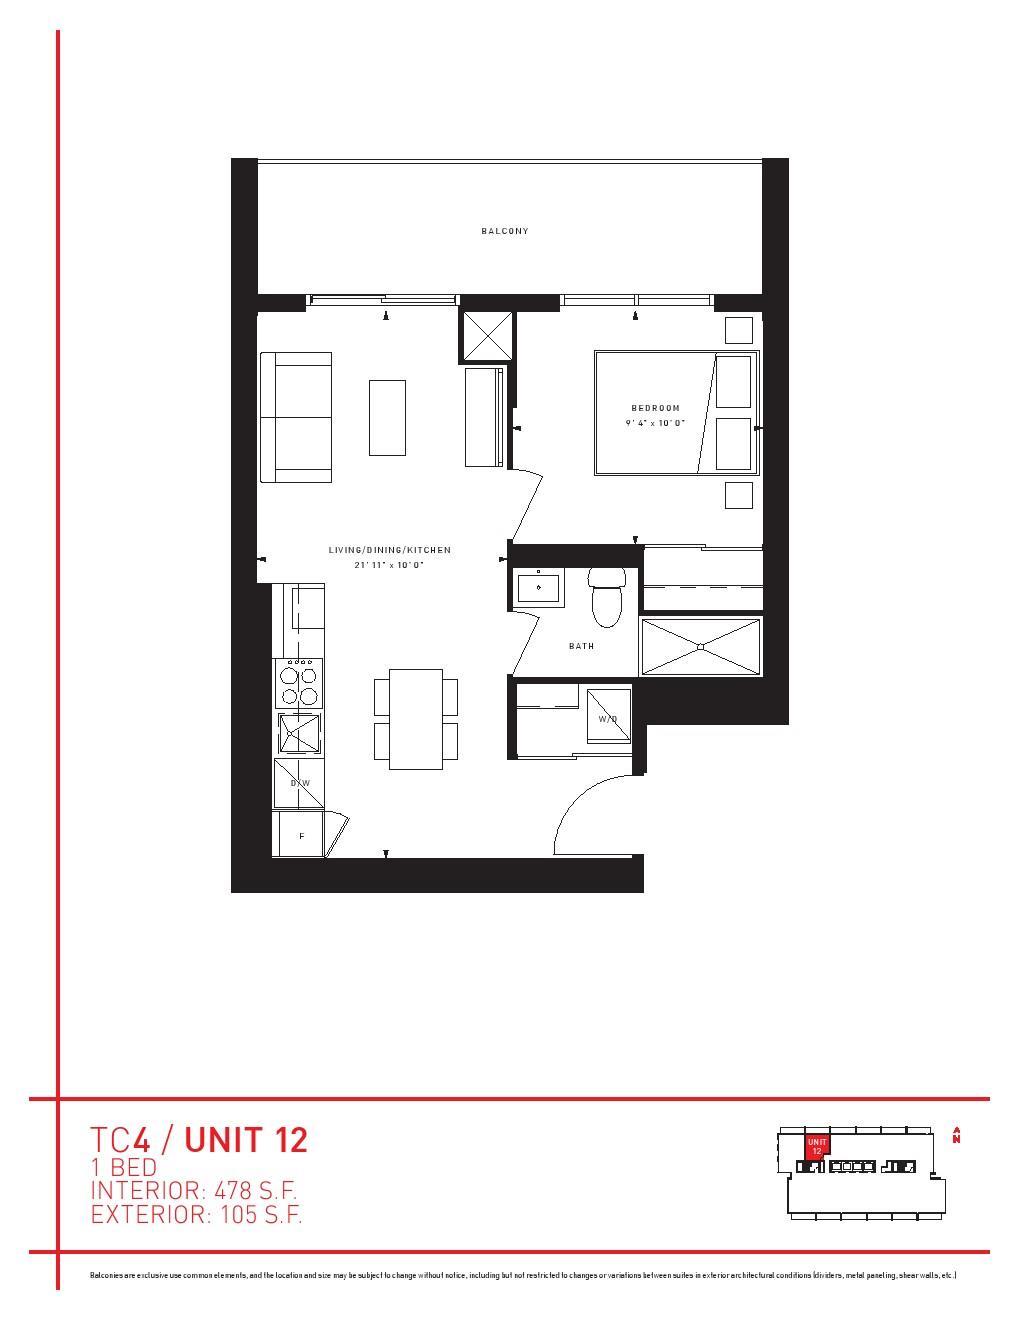 Transit City 4 Condos Floor Plans